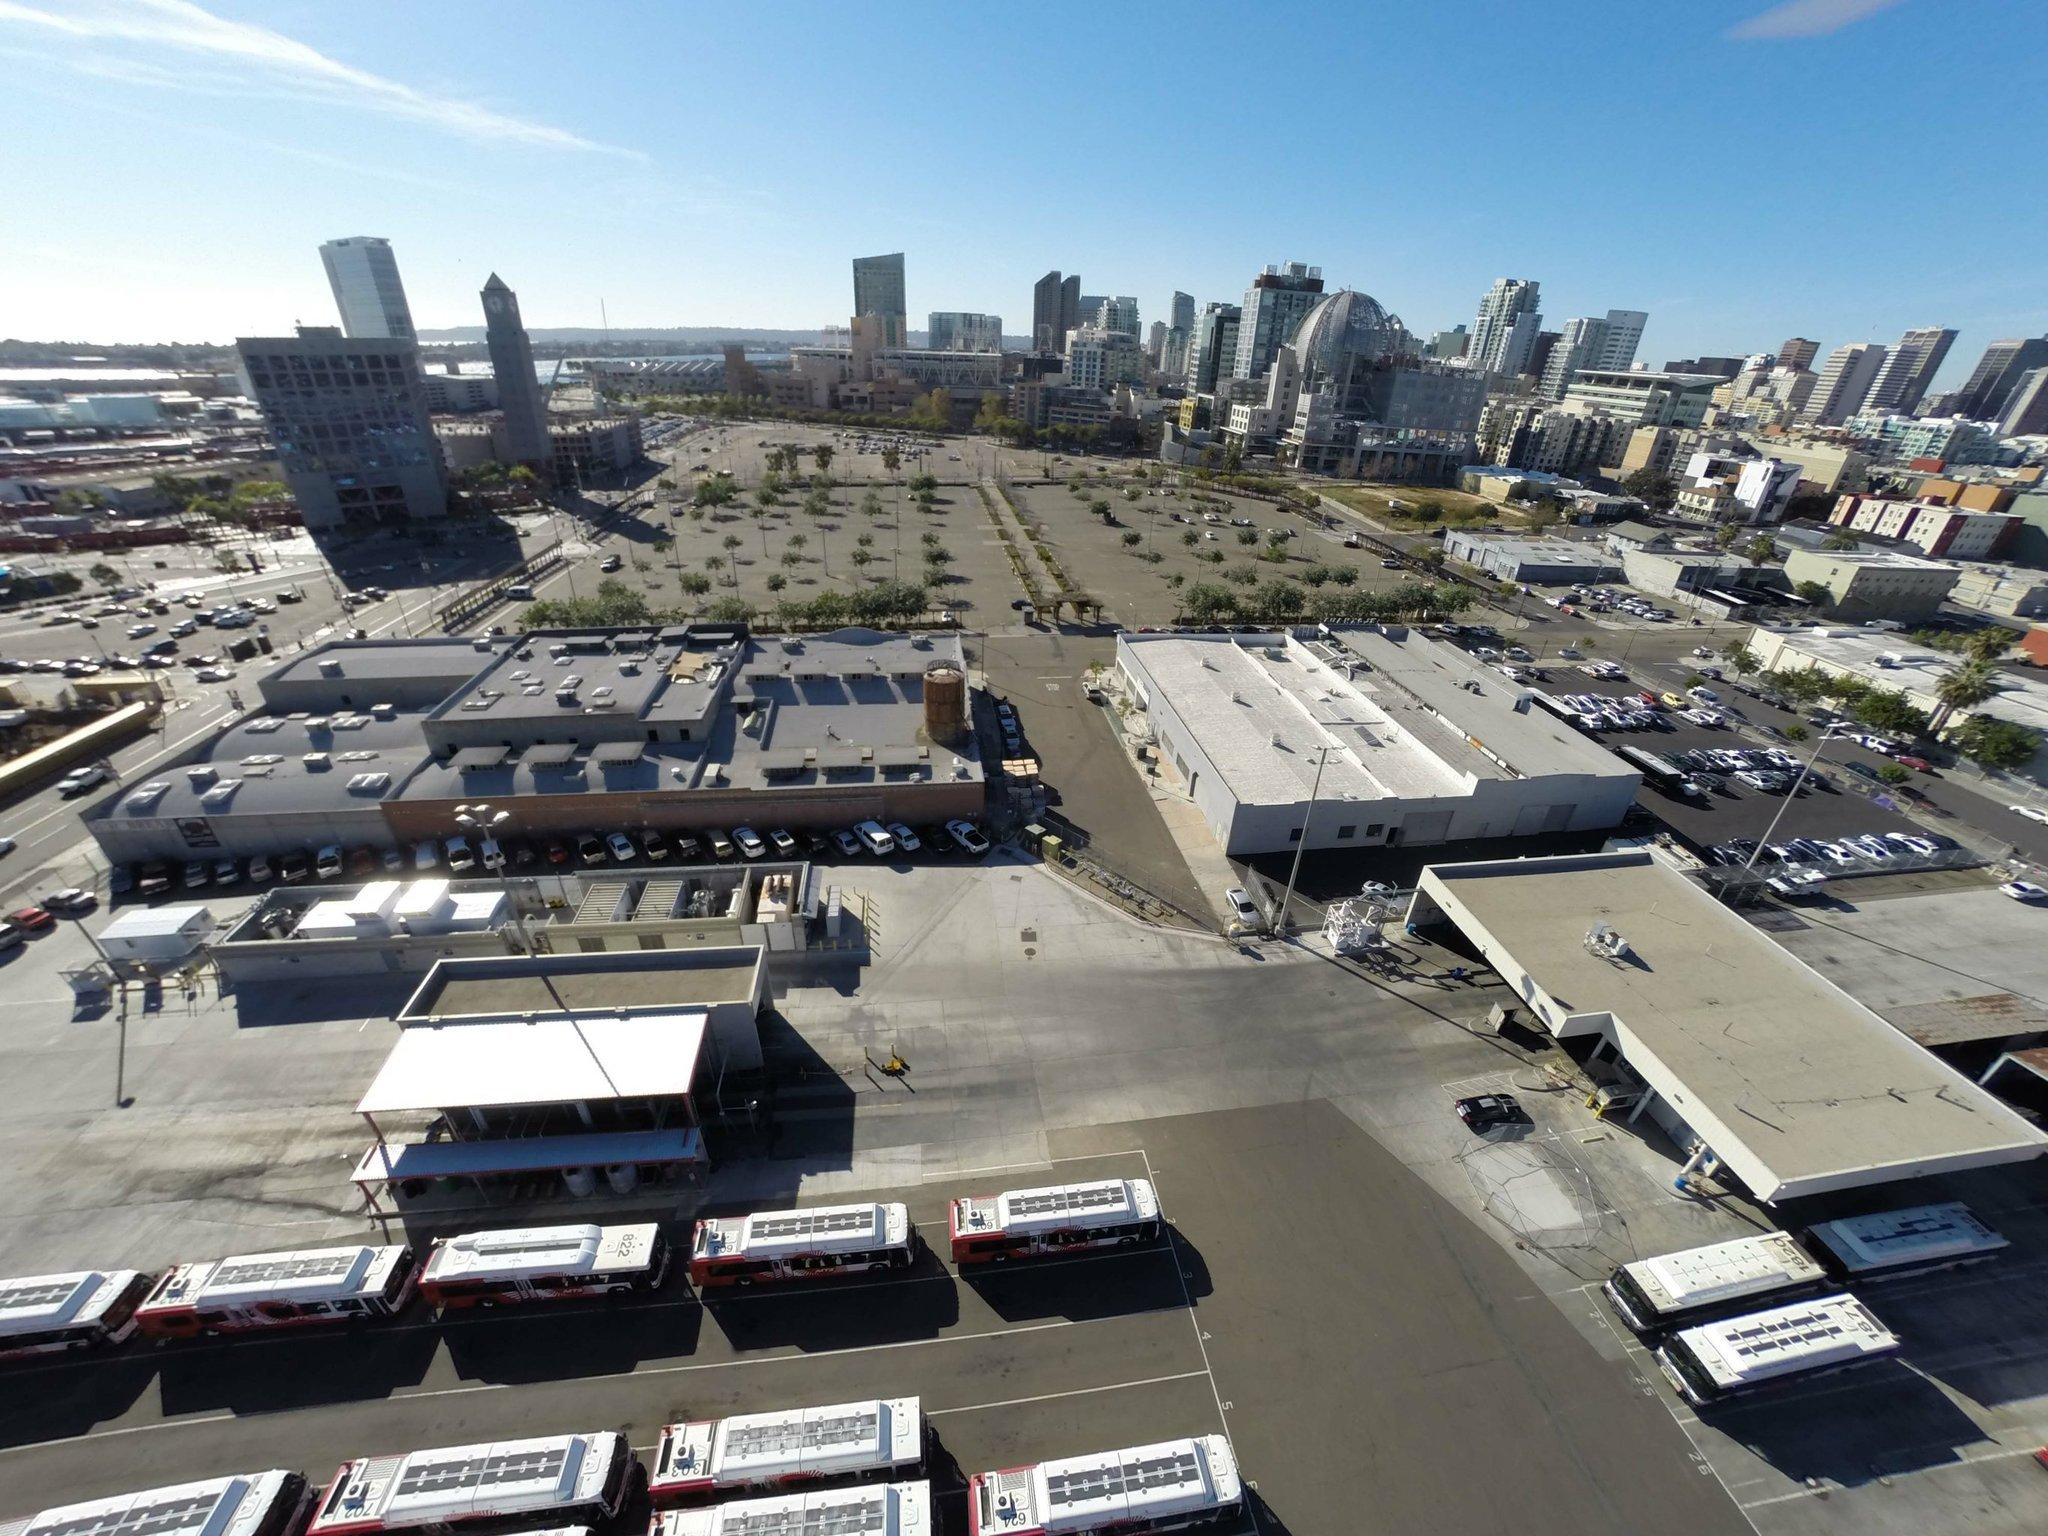 San Diego MTS Operating Facility Location Optimization